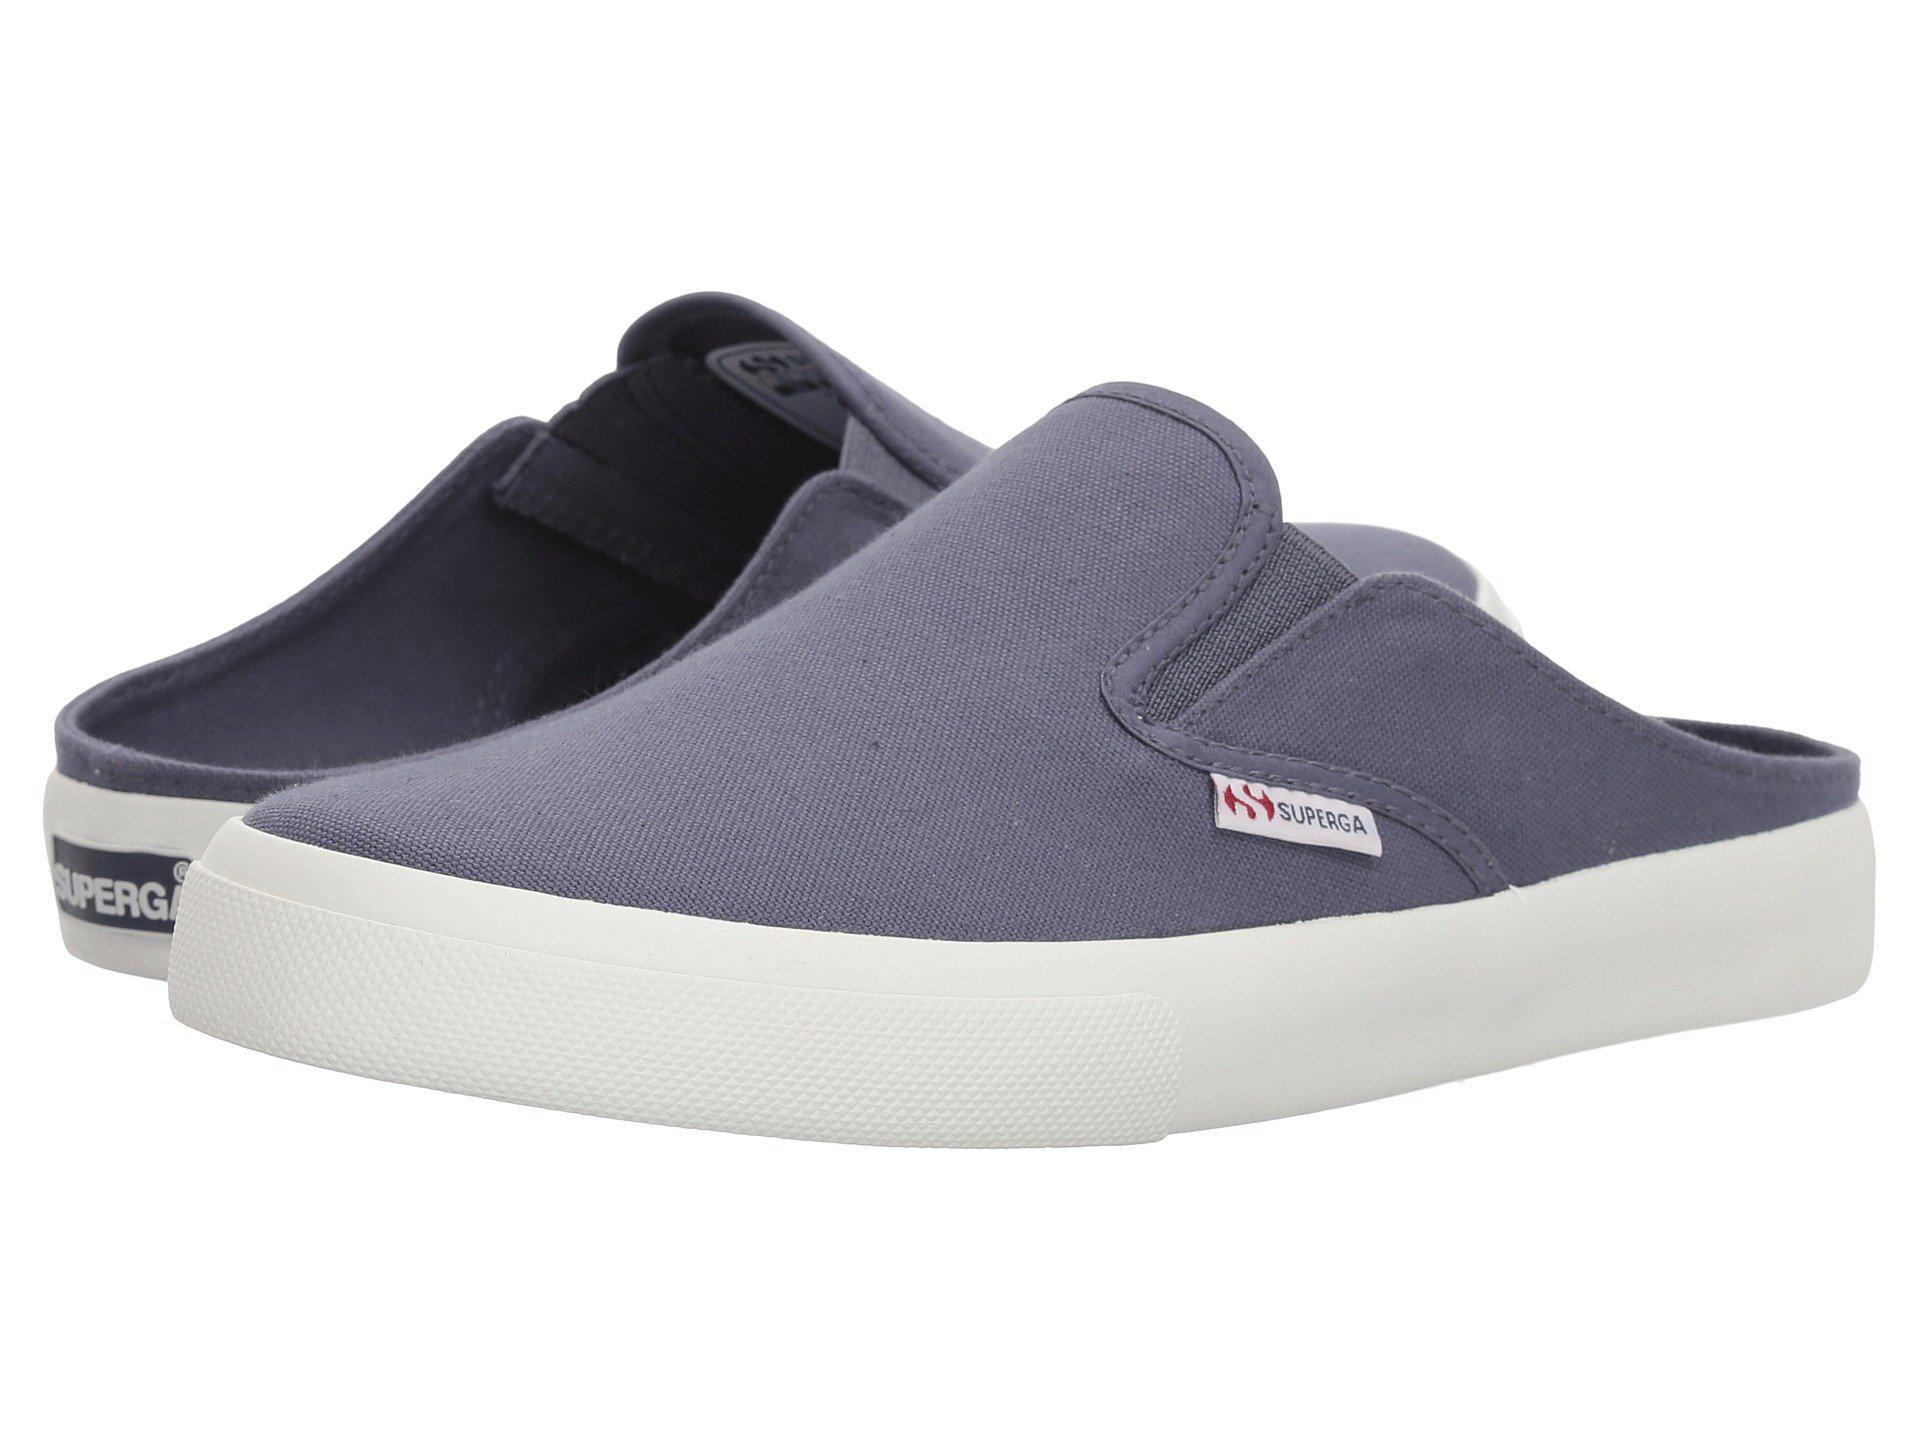 Superga 2388 COTW Slip-on Sneaker fV8tO1